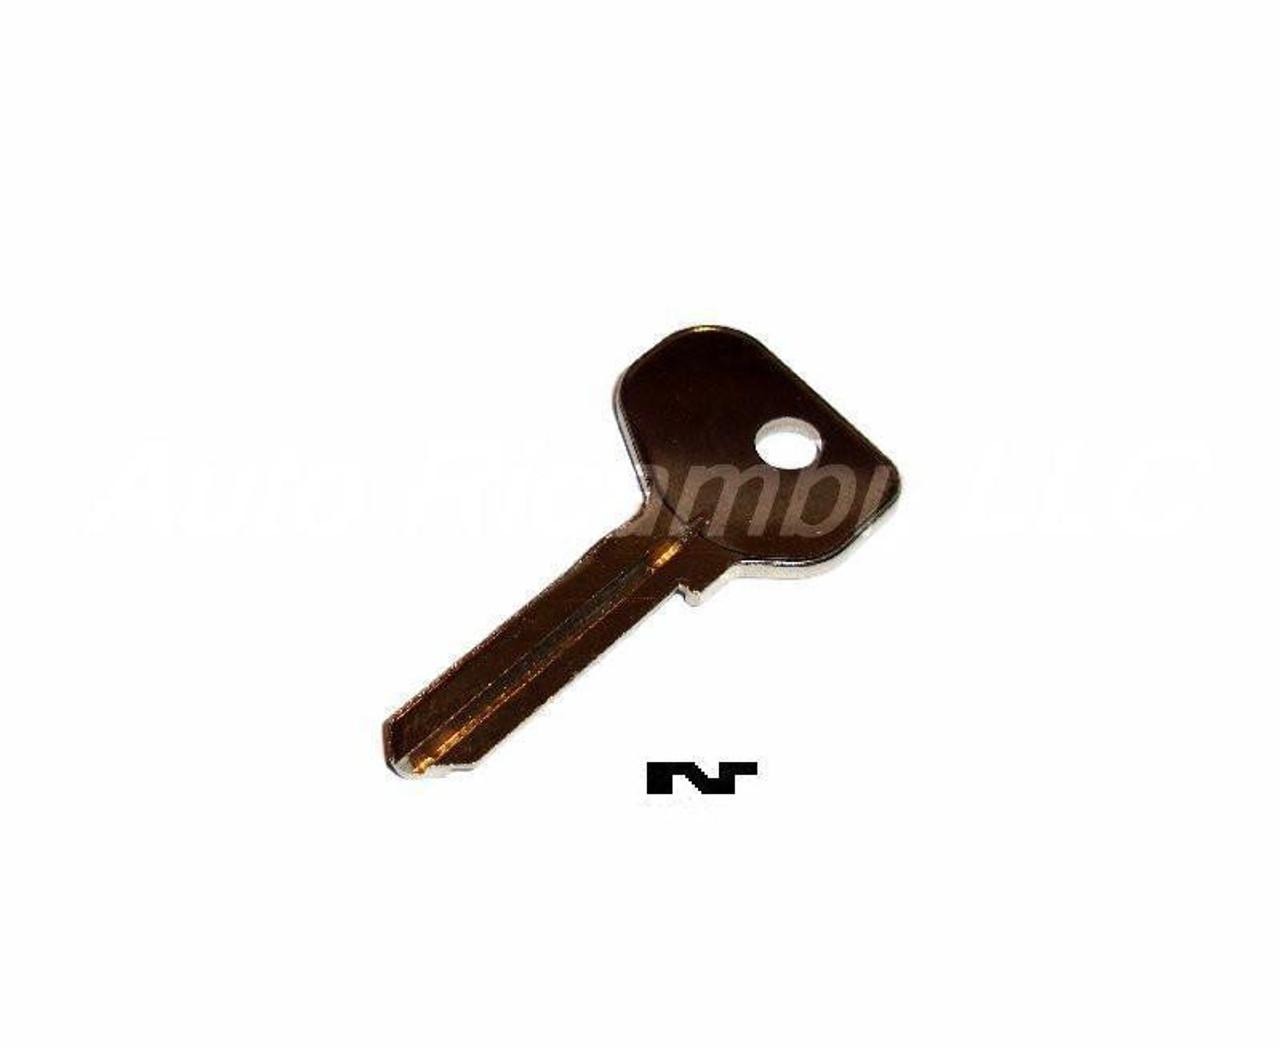 Single Sided Key Blank Series #1